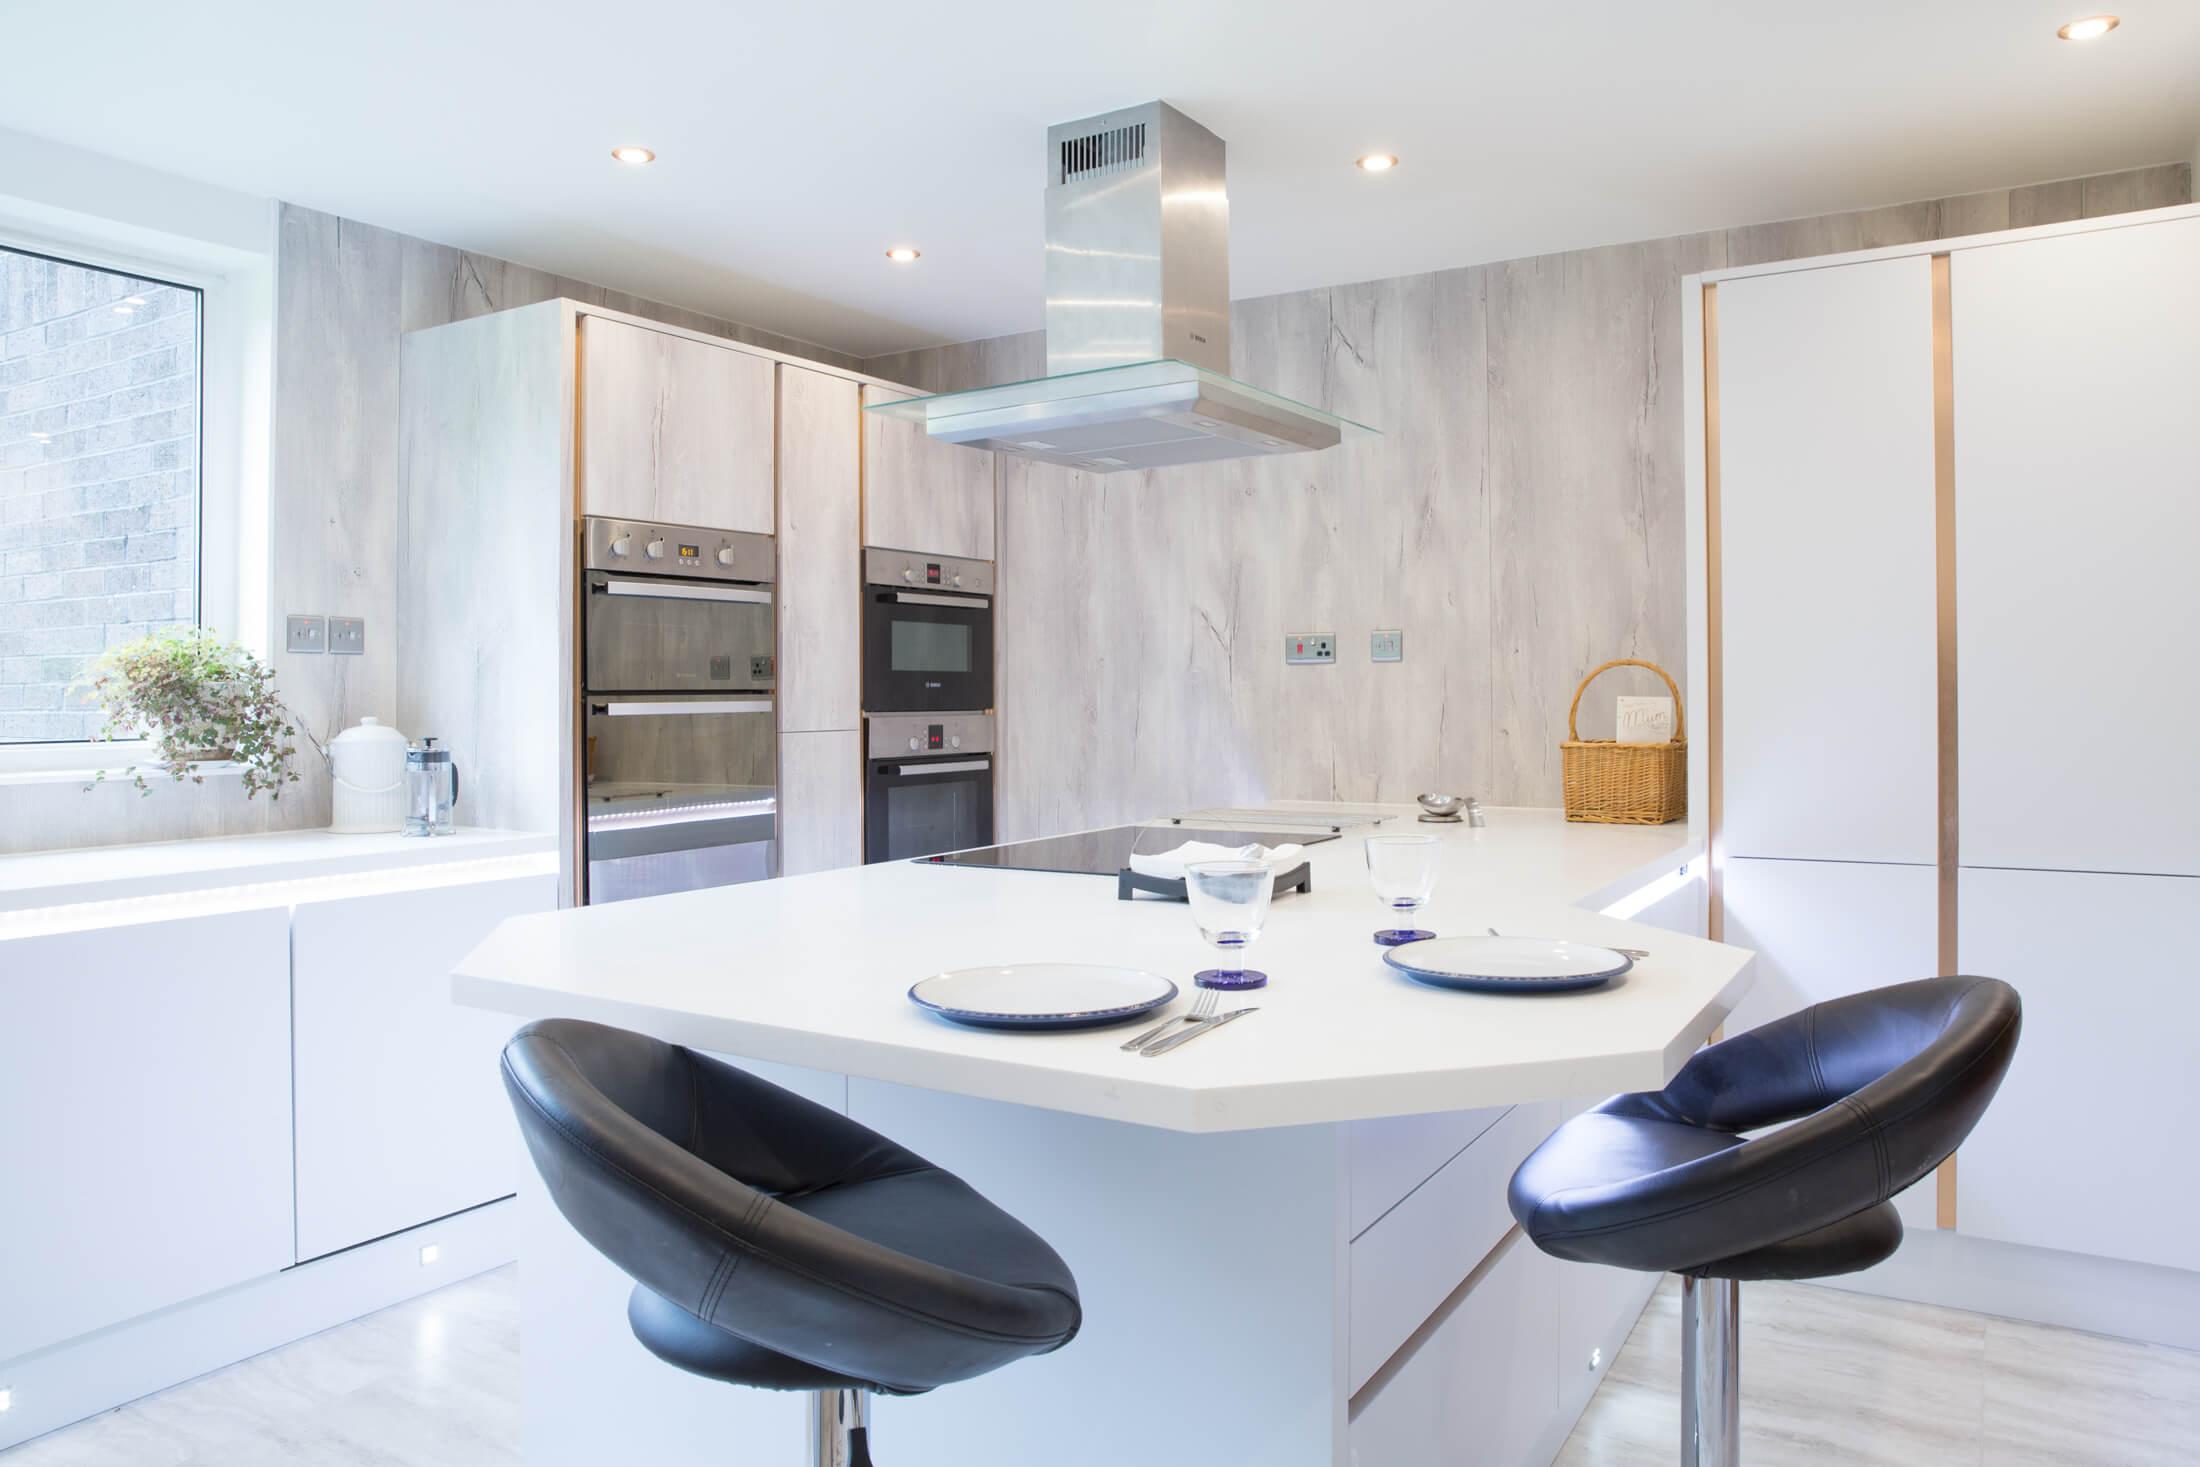 White, shiny, brand new kitchen in Glasgow apartment